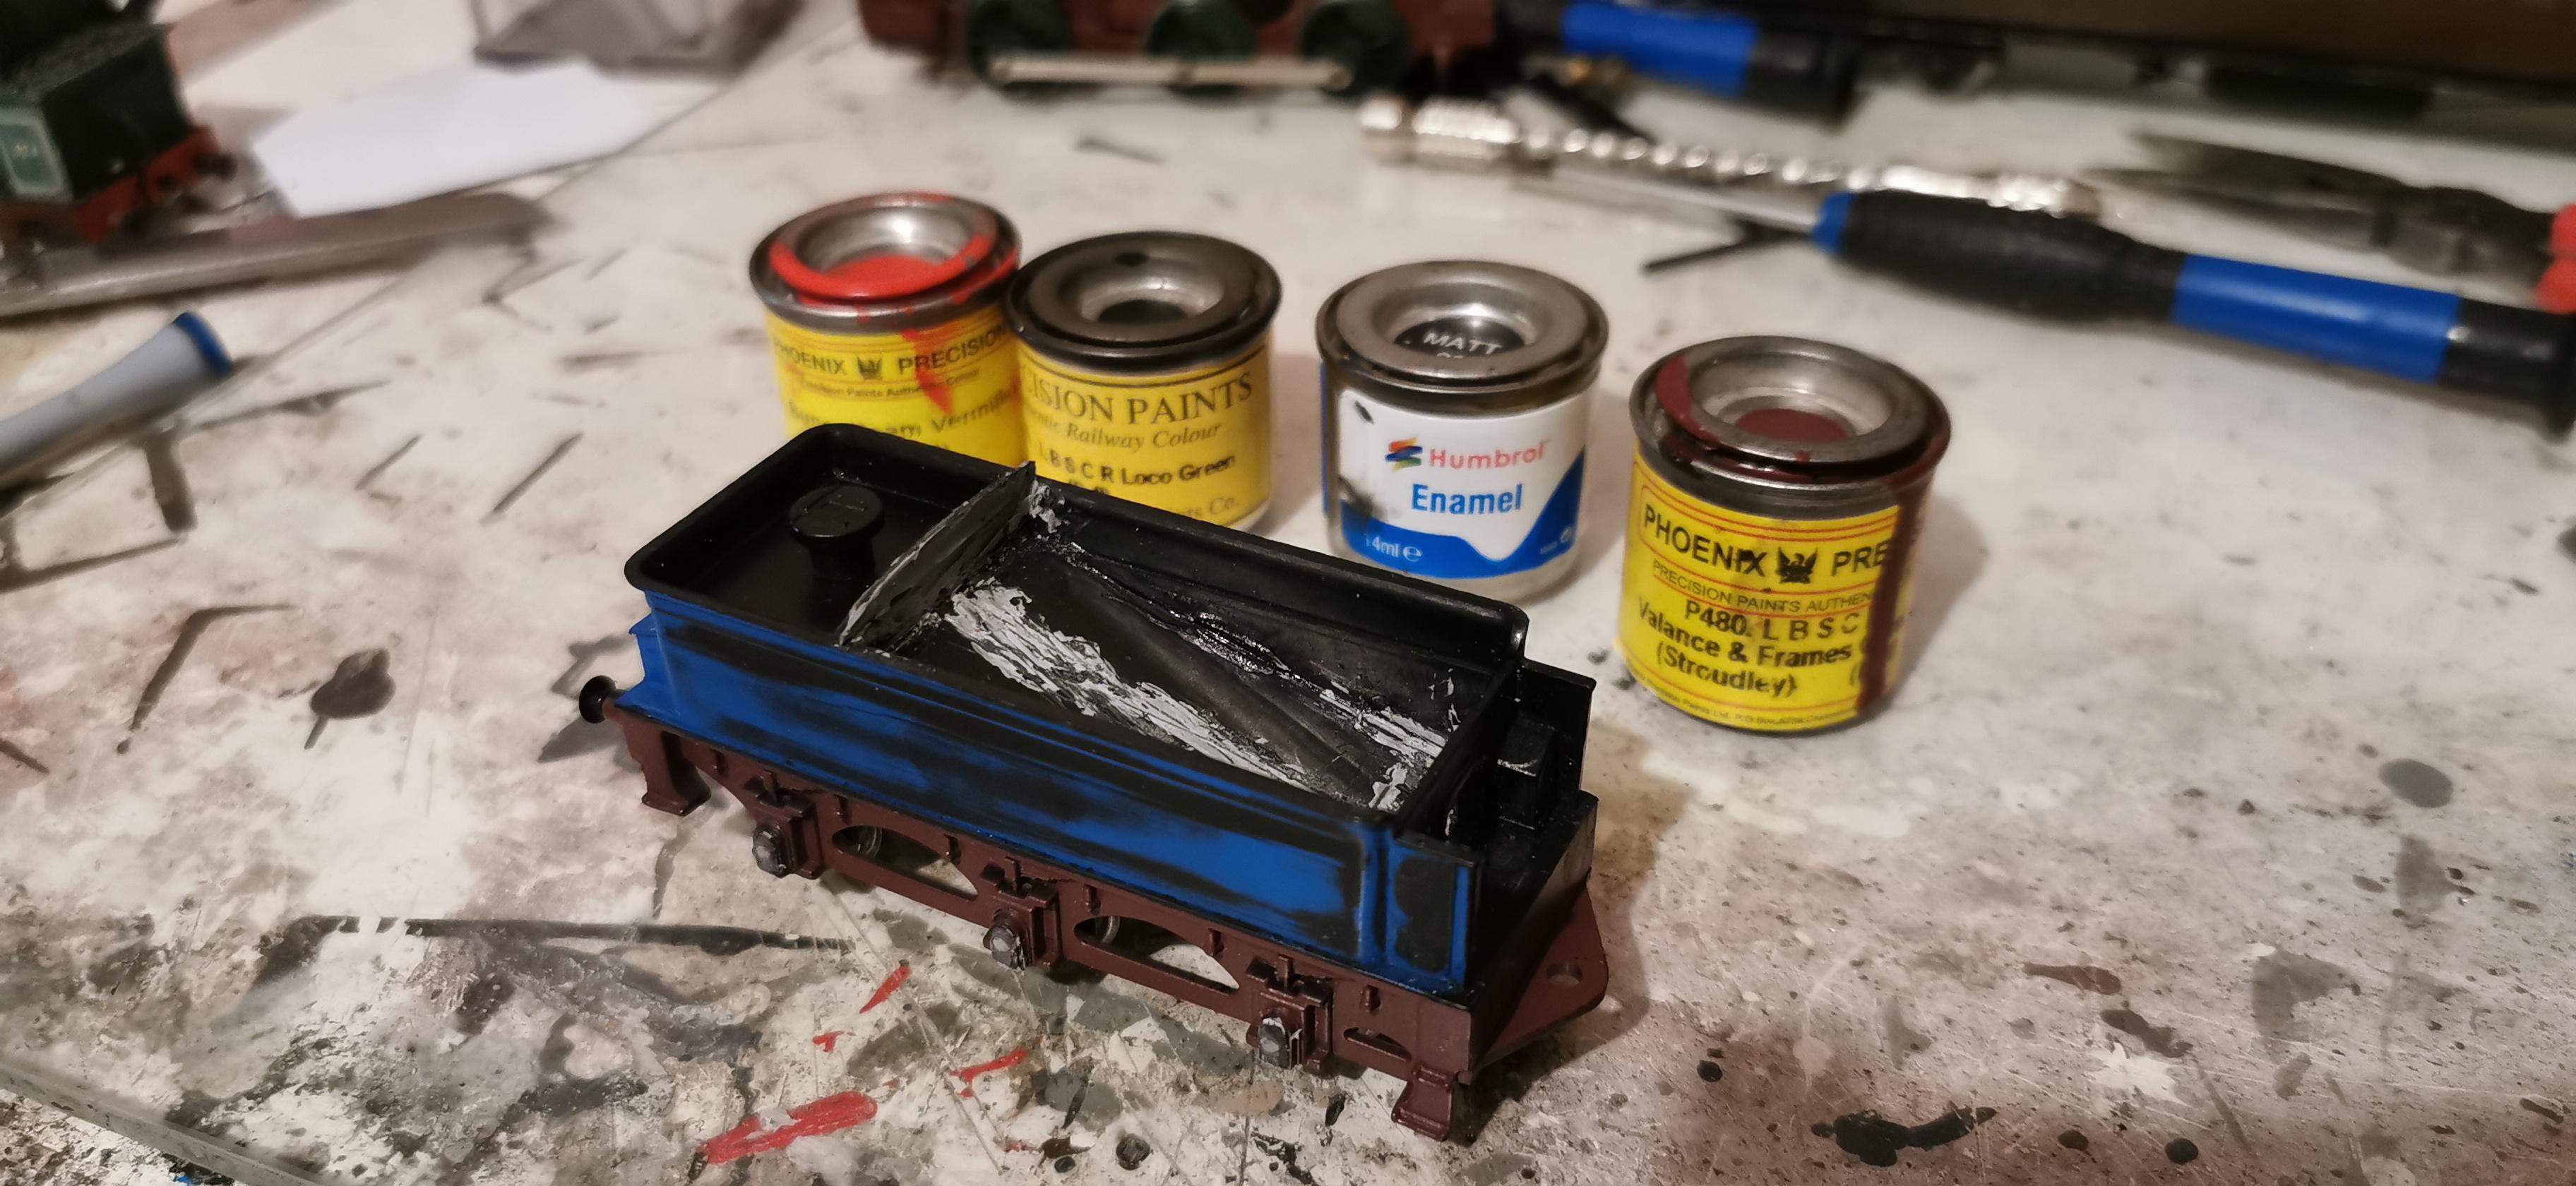 Preparing to paint